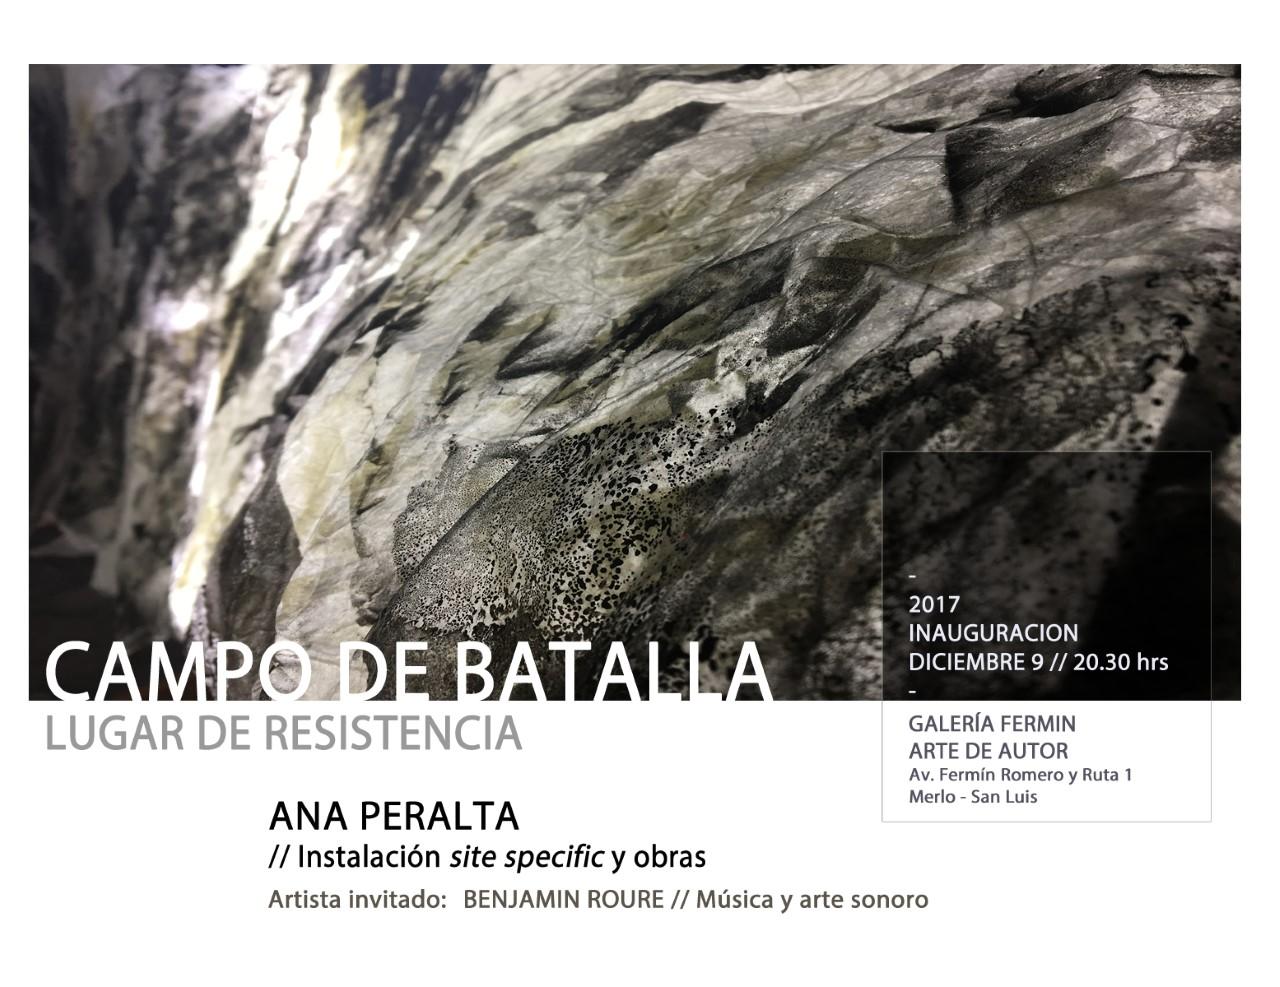 """CAMPO DE BATALLA -  LUGAR DE RESISTENCIA"" de ANA PERALTA"